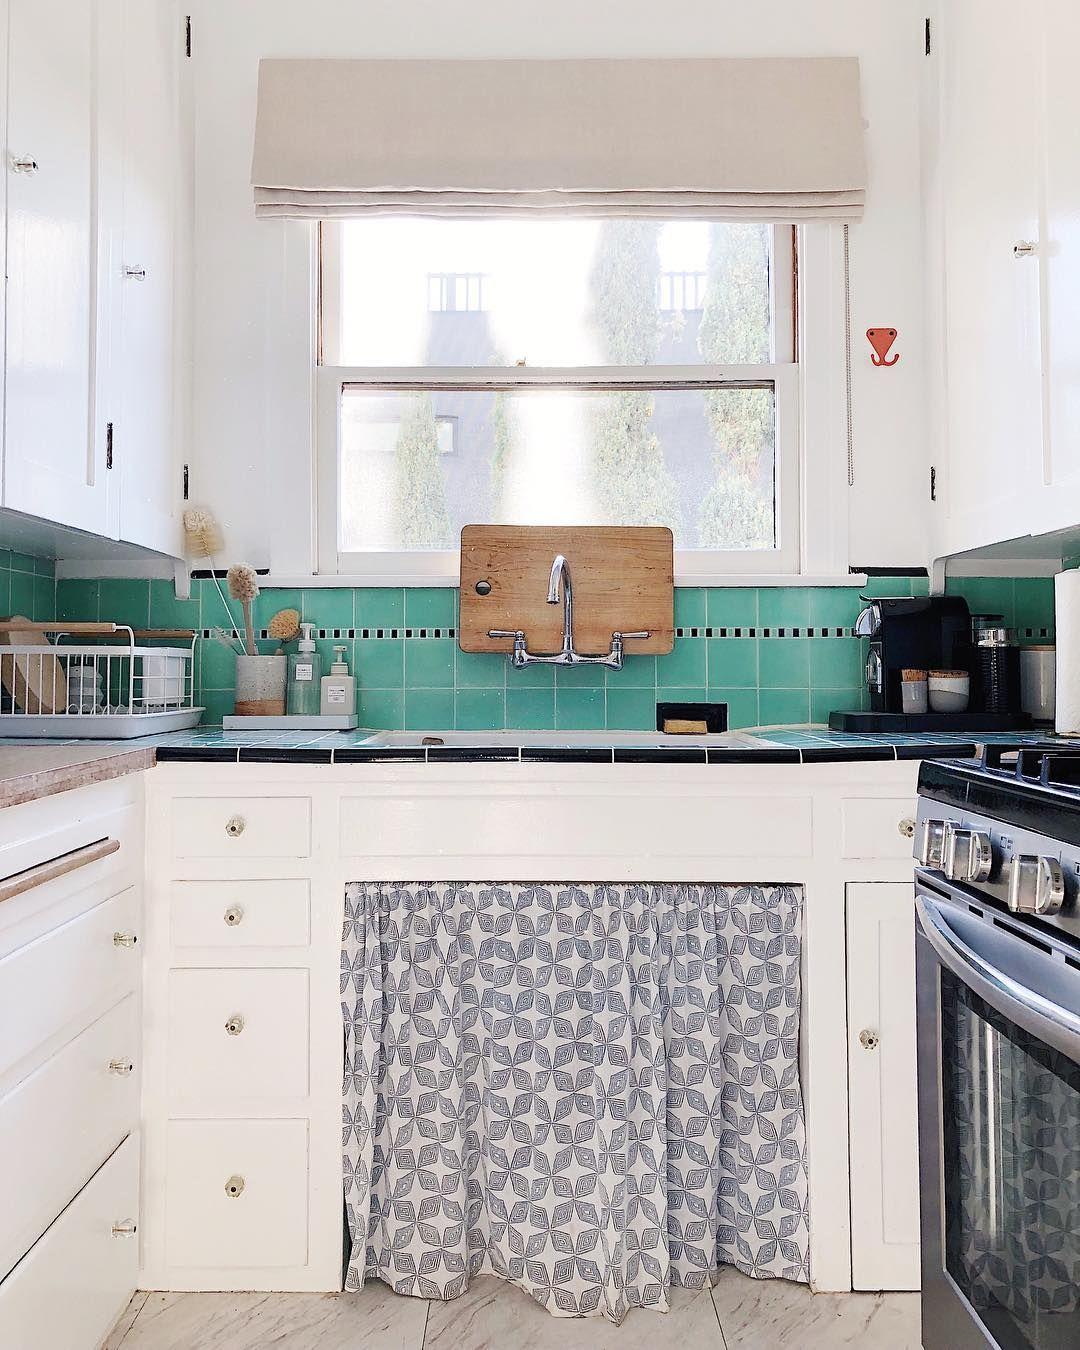 Vintage White Kitchen With Turquoise Backsplash Tile And Cute Sink Skirt Kitchen Inspiration Design Diy Kitchen Renovation Custom Window Coverings